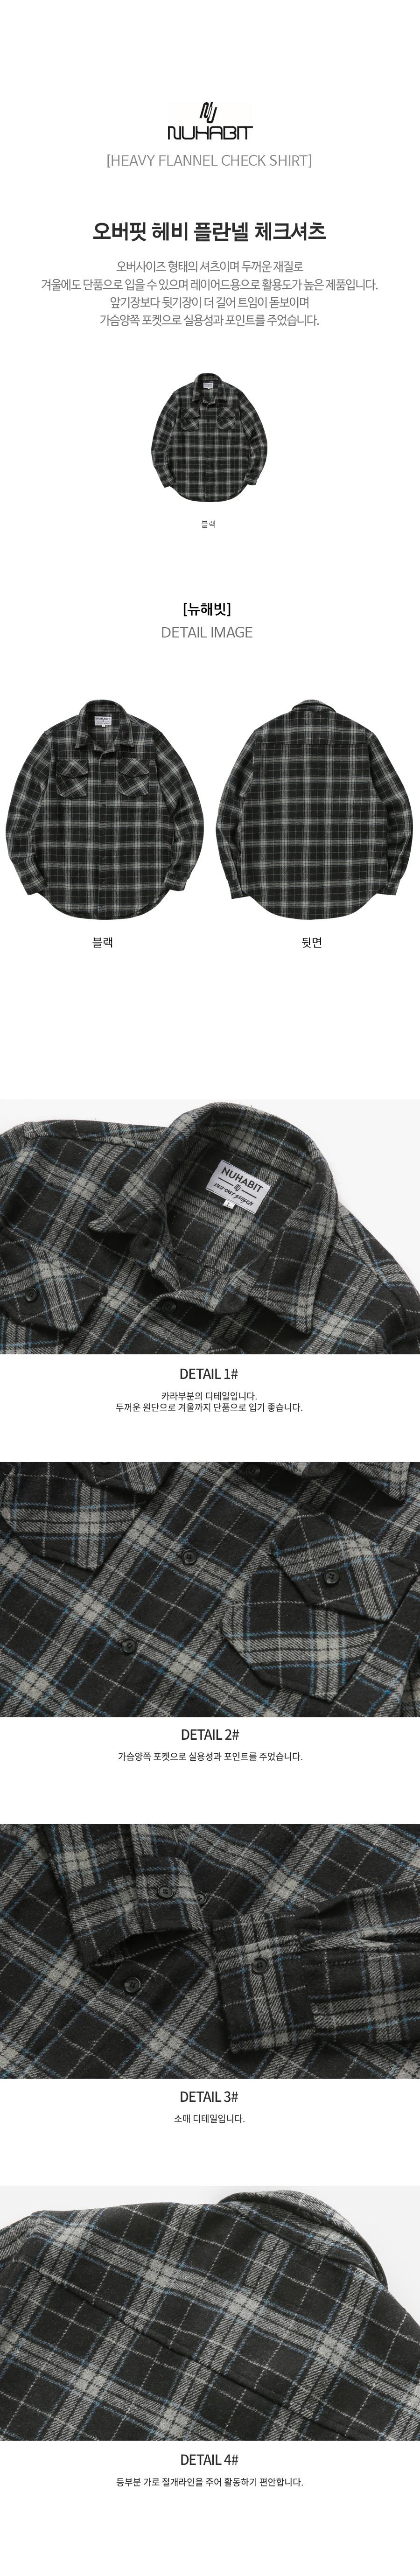 flannel_shirts_black.jpg